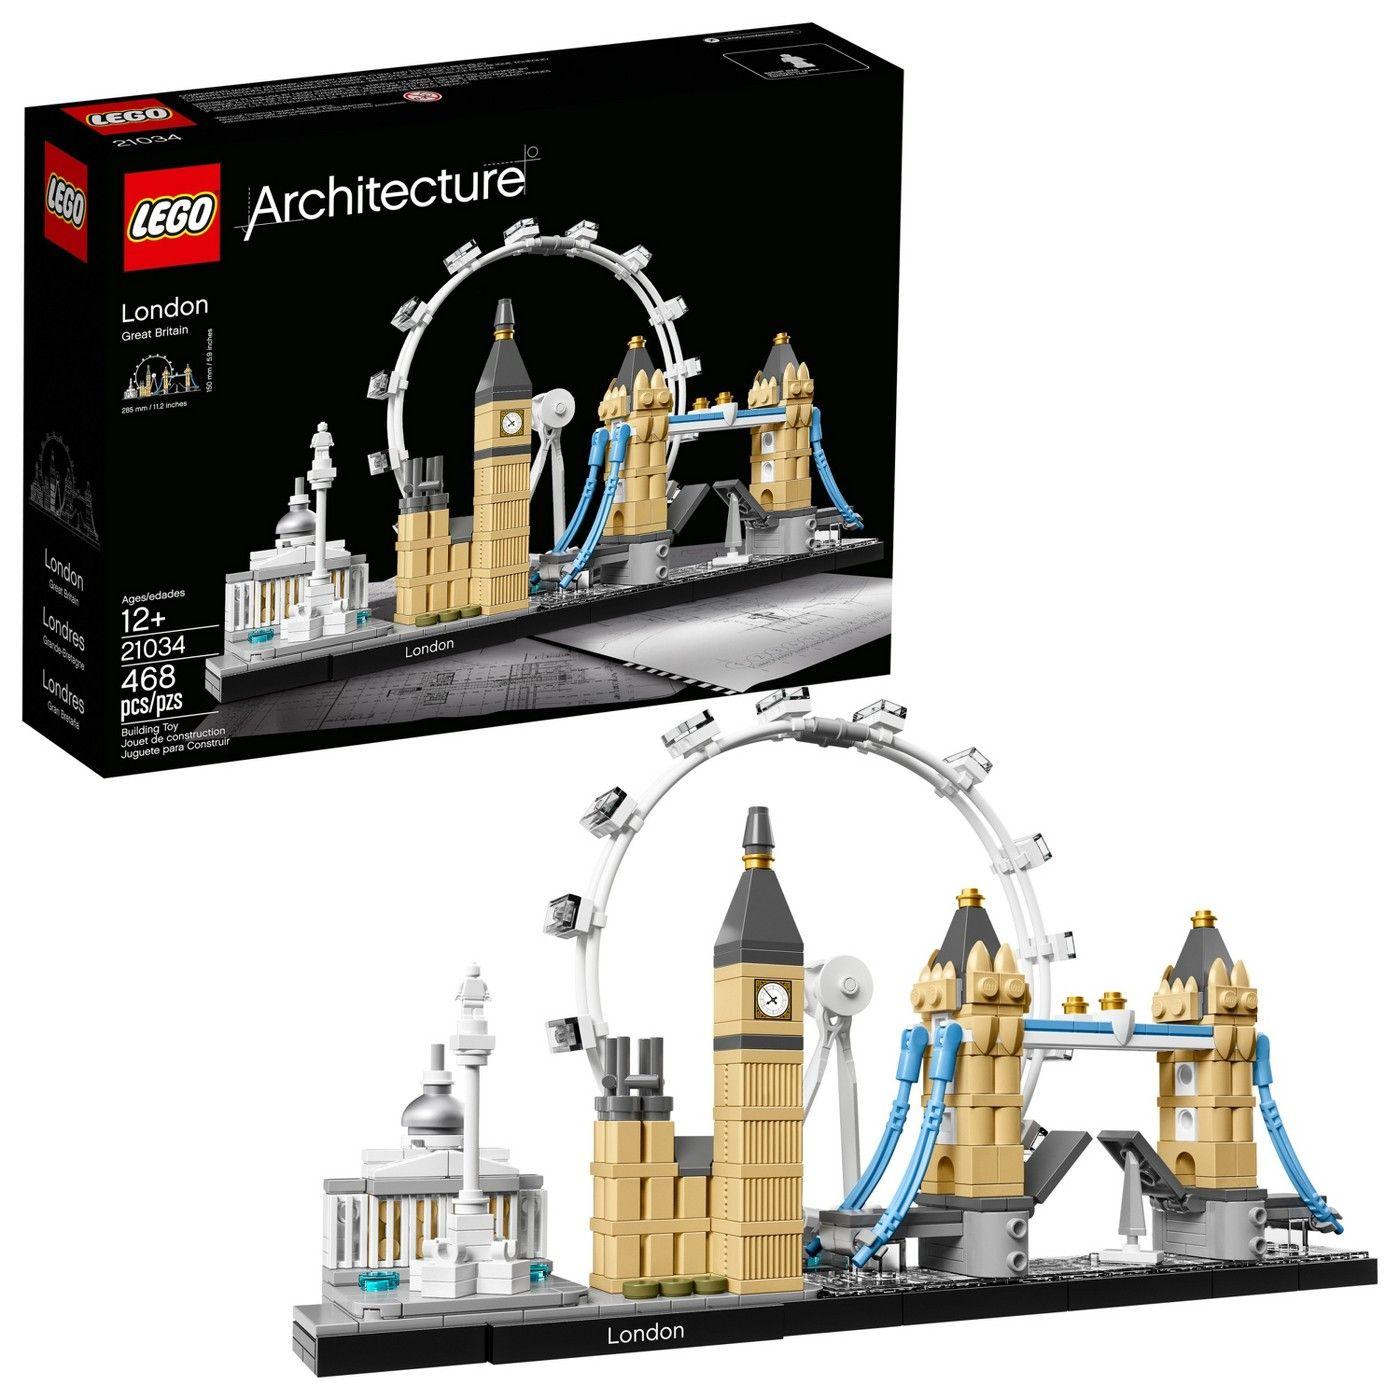 LEGO Architecture London 21034 Lego architecture, Lego